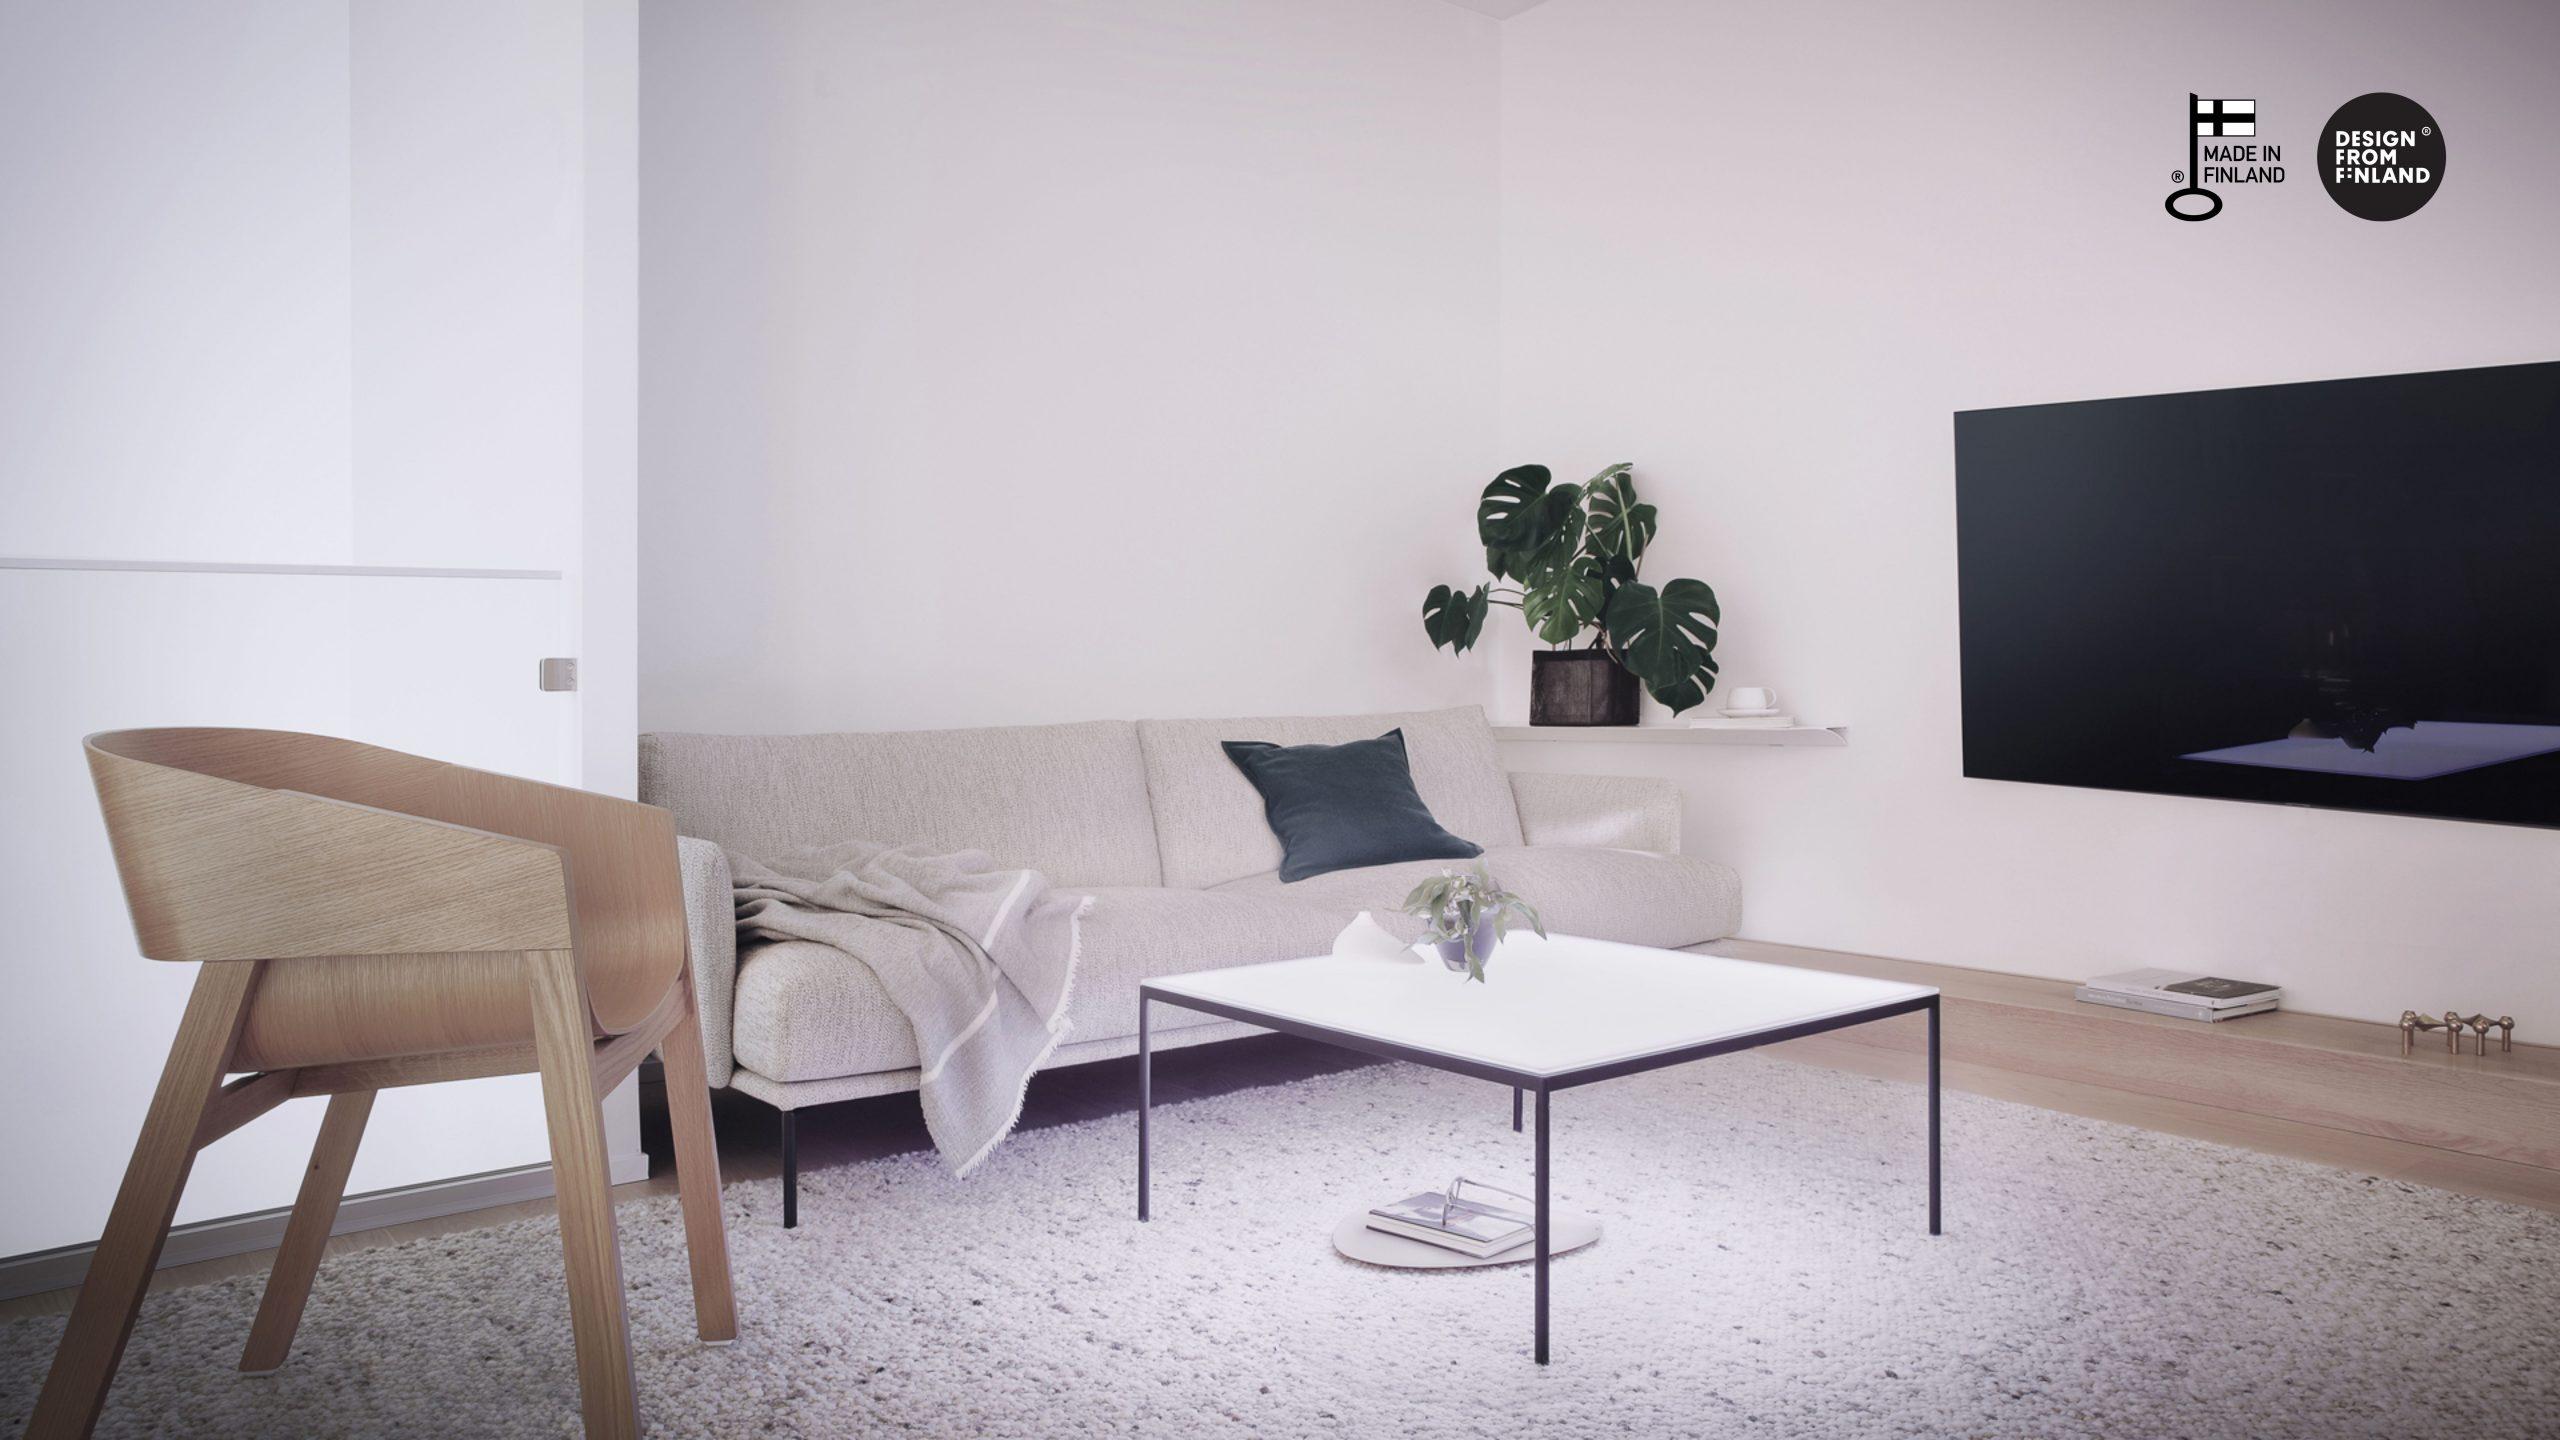 aicci-t1-xl-luminous-coffee-table-design-key-flag-logos